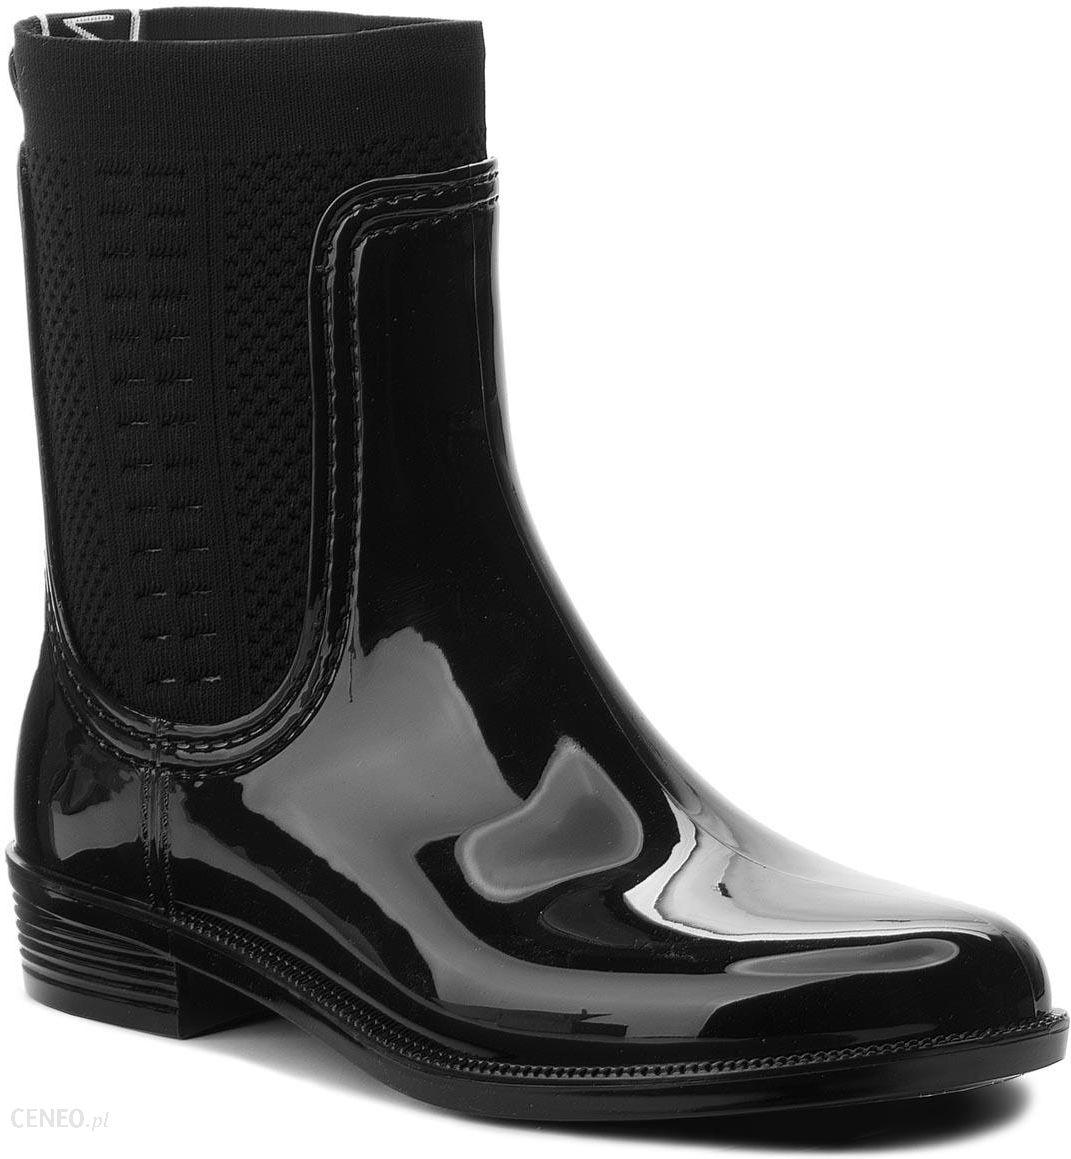 ae20c2fe93a6c Kalosze TOMMY HILFIGER - Tommy Knit Rain Boot FW0FW02940 Black 990 -  zdjęcie 1